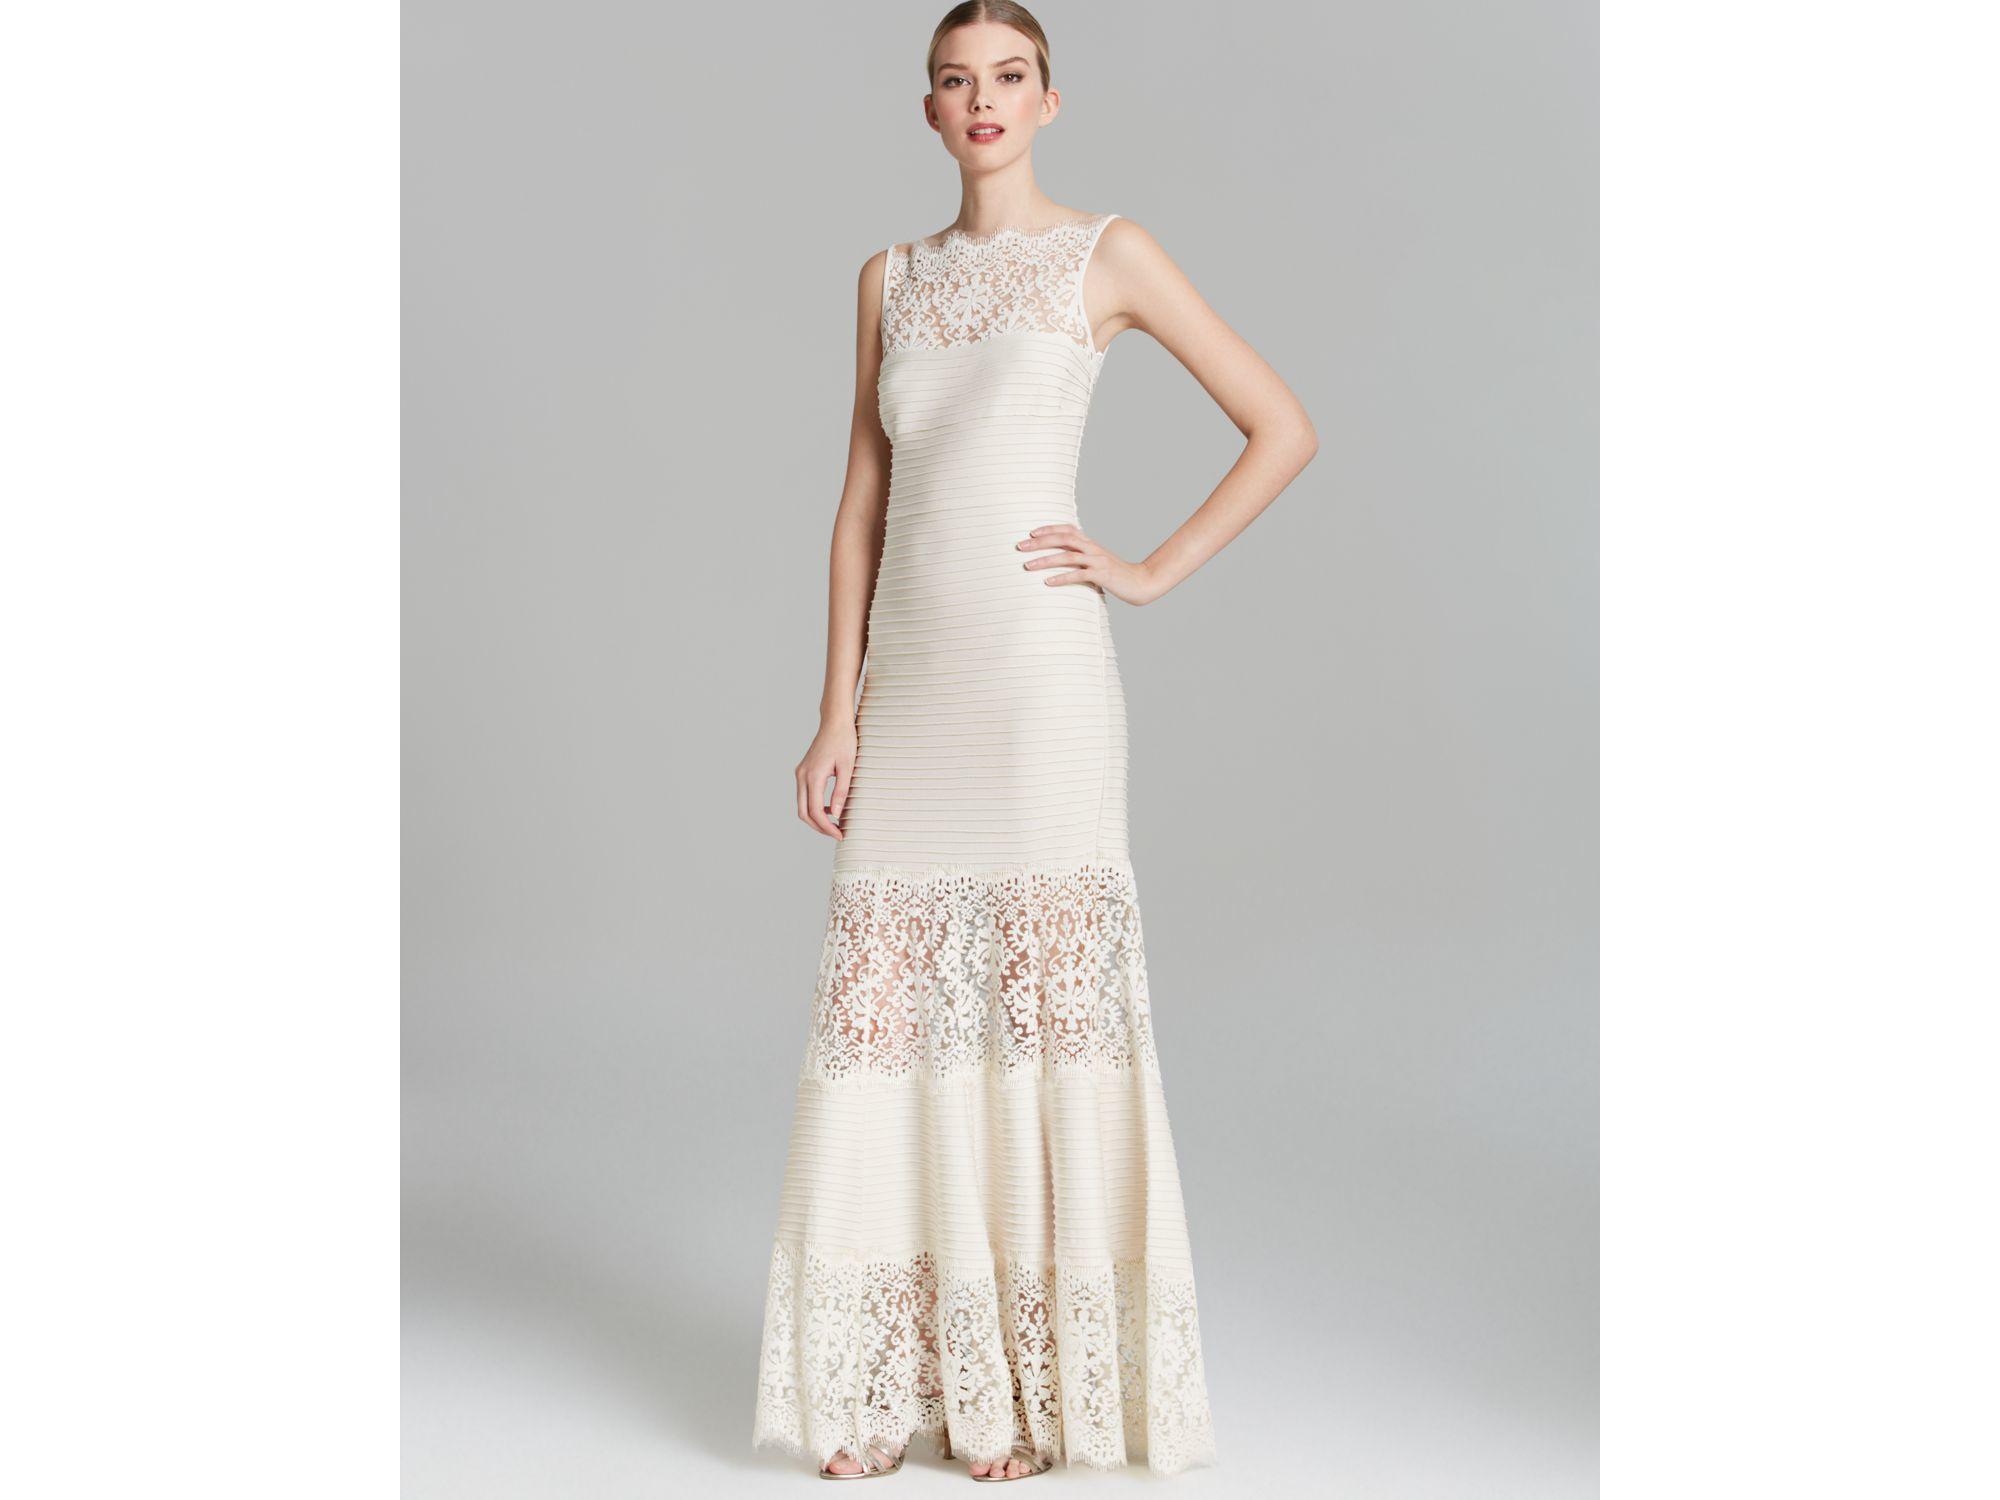 Lyst - Tadashi Shoji Sleeveless Ribbed Stretch Dress - With Lace ...